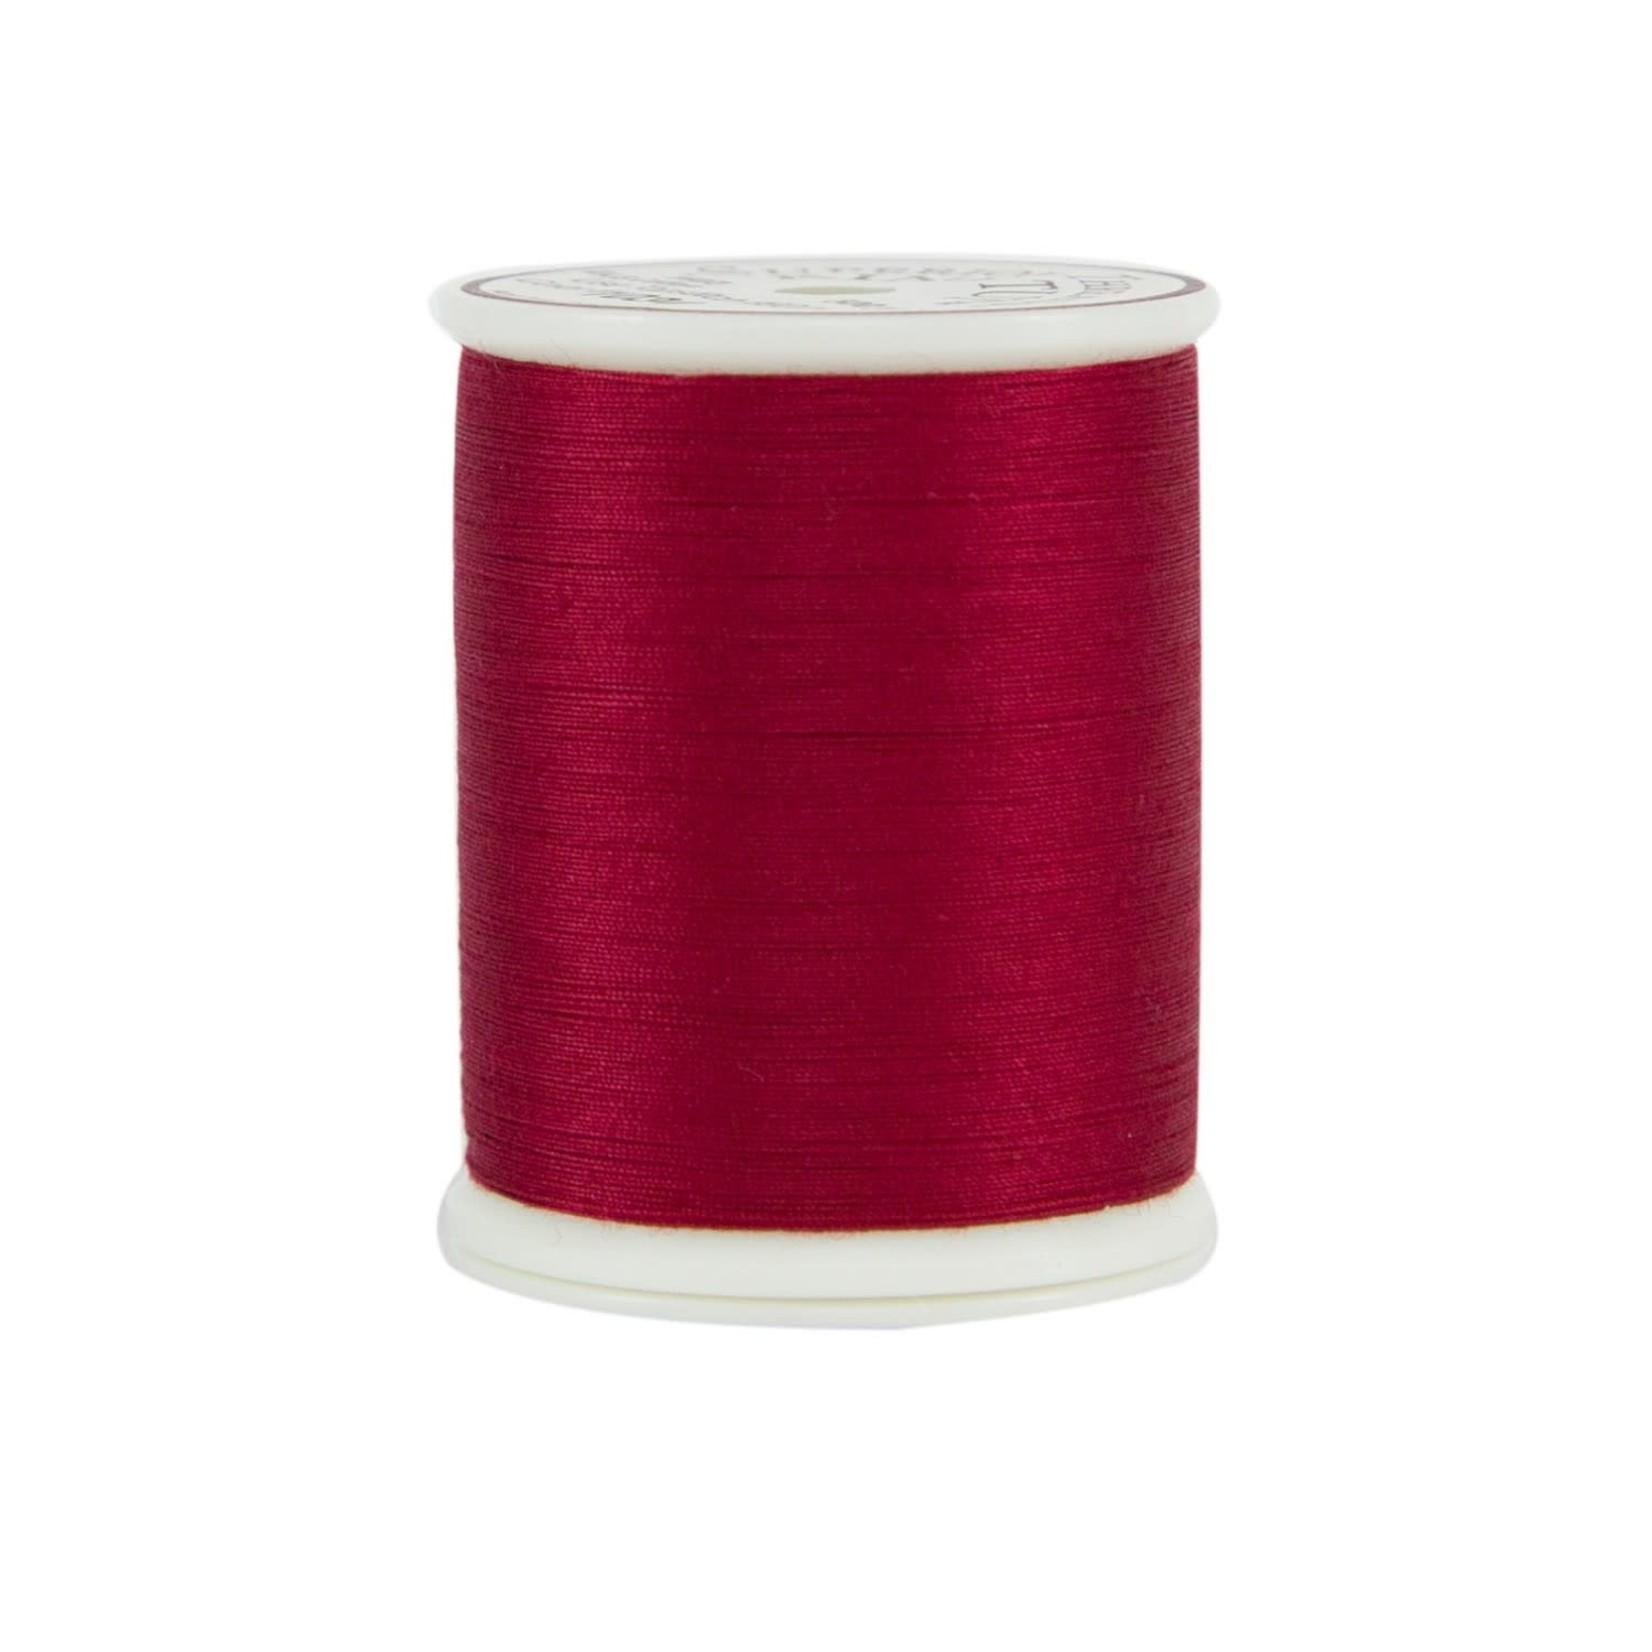 Superior Threads King Tut - #40 - 457 m - 1034 Robin Red